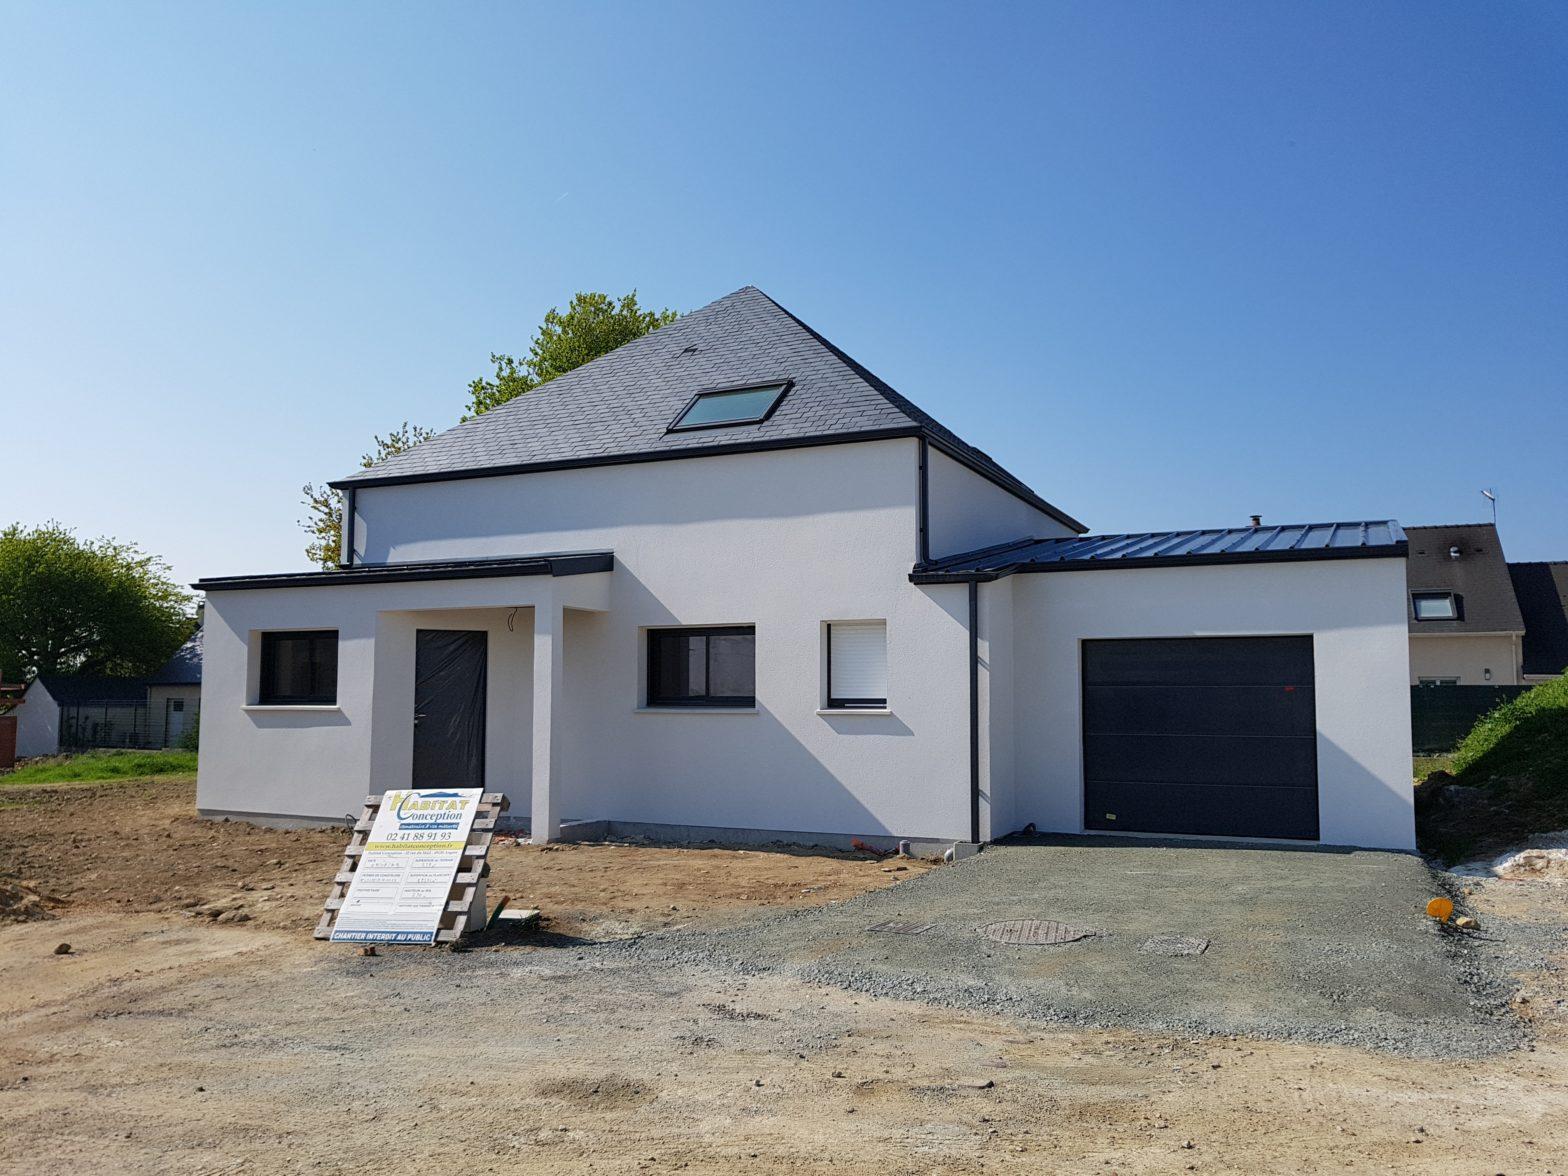 maison,etage,comble,toiture ardoise,corne